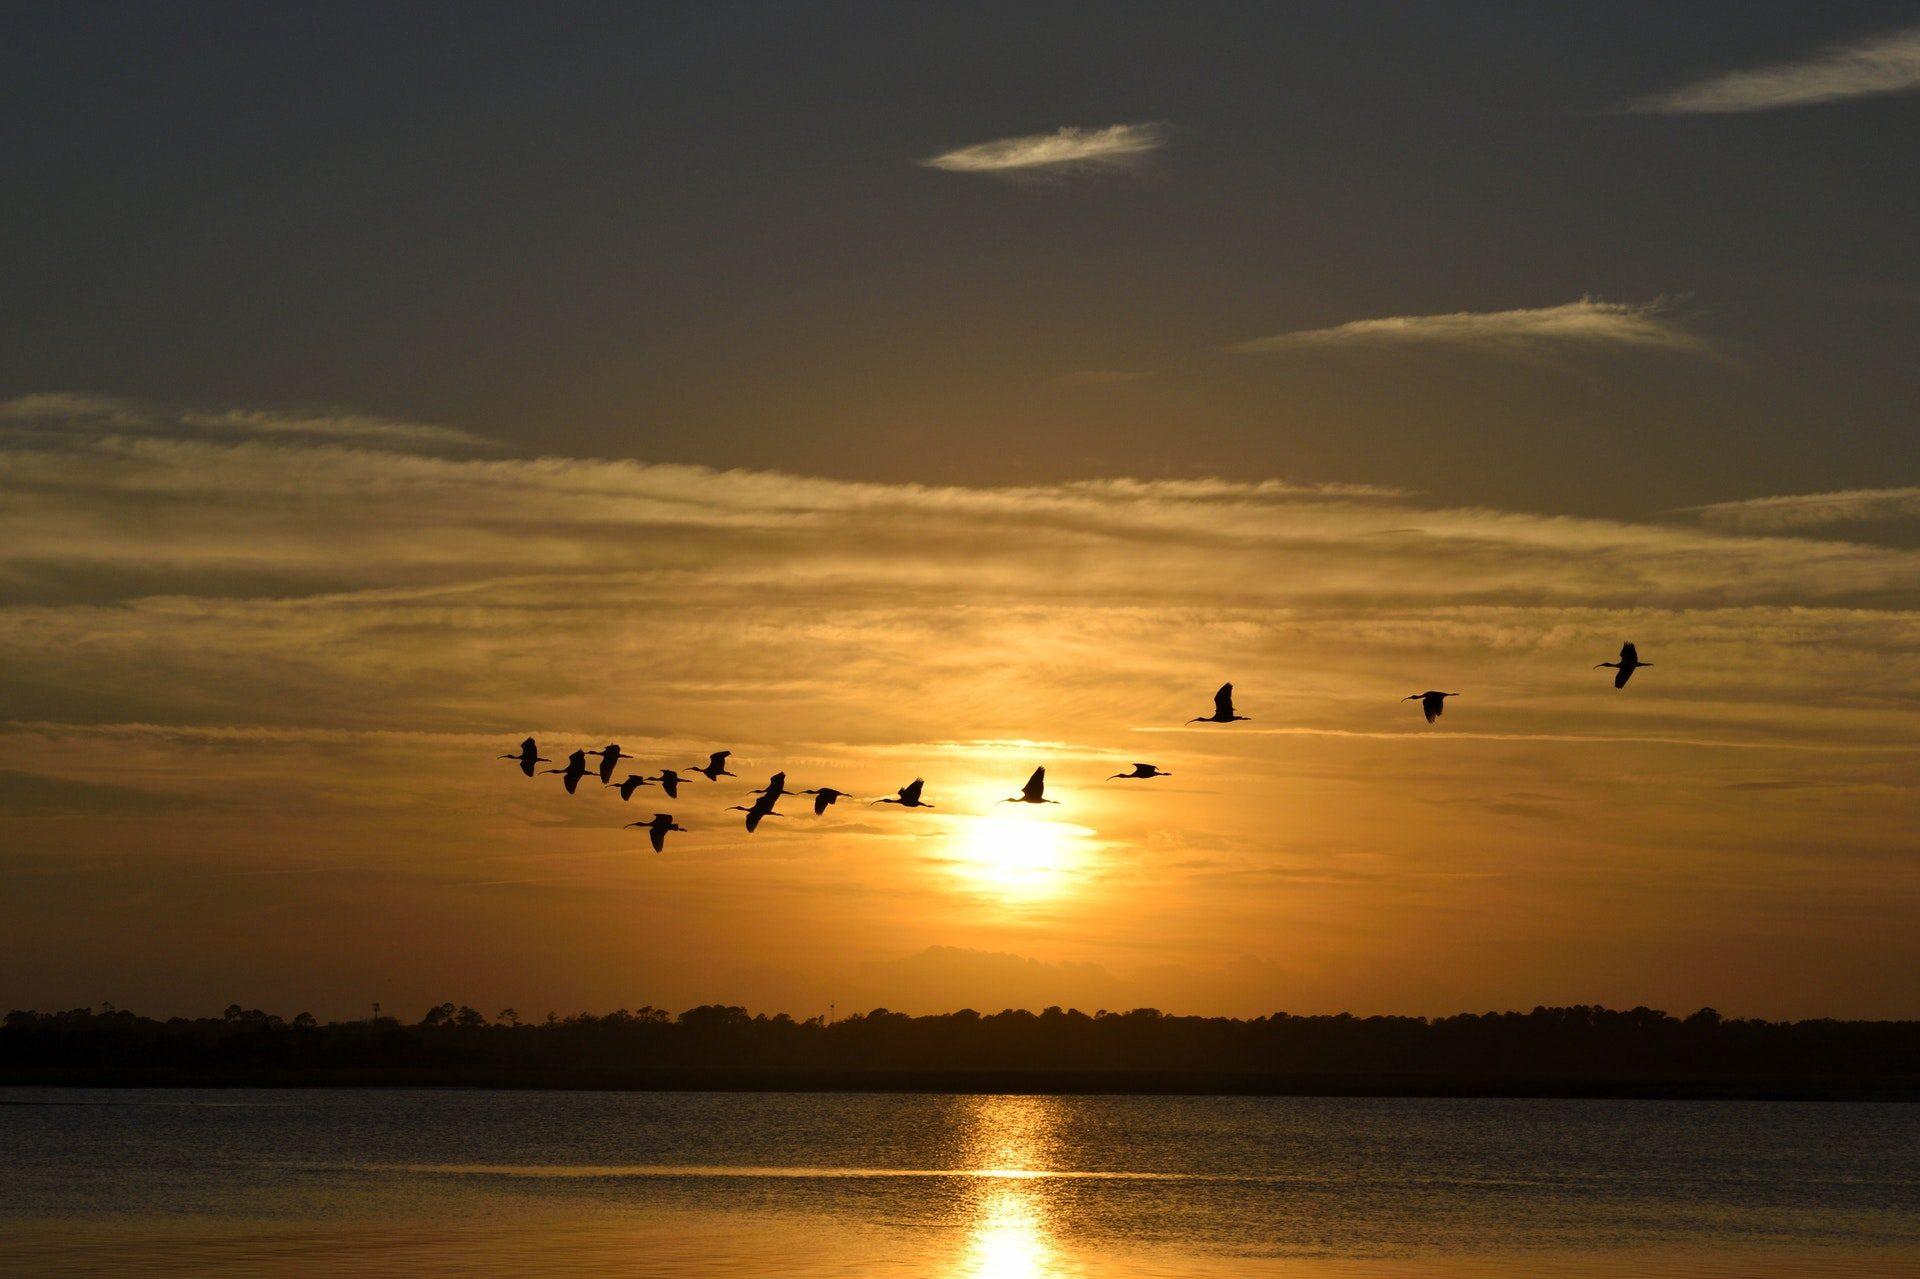 birds flying